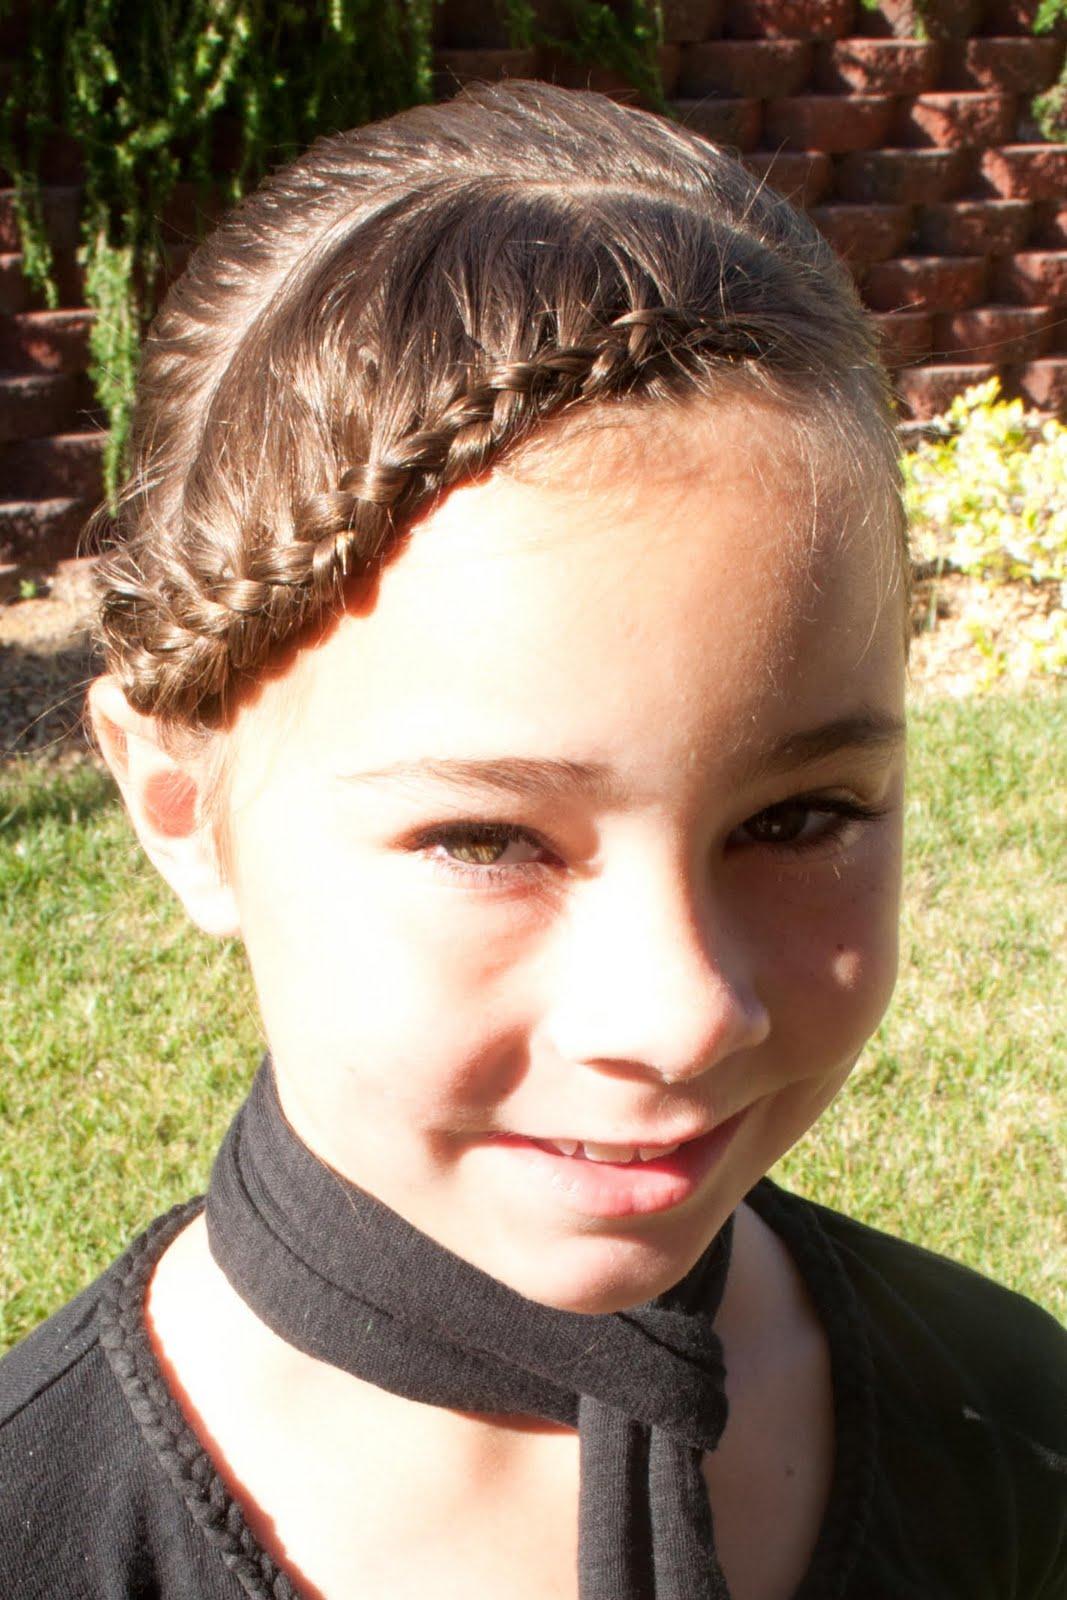 Princess Braid with Bangs